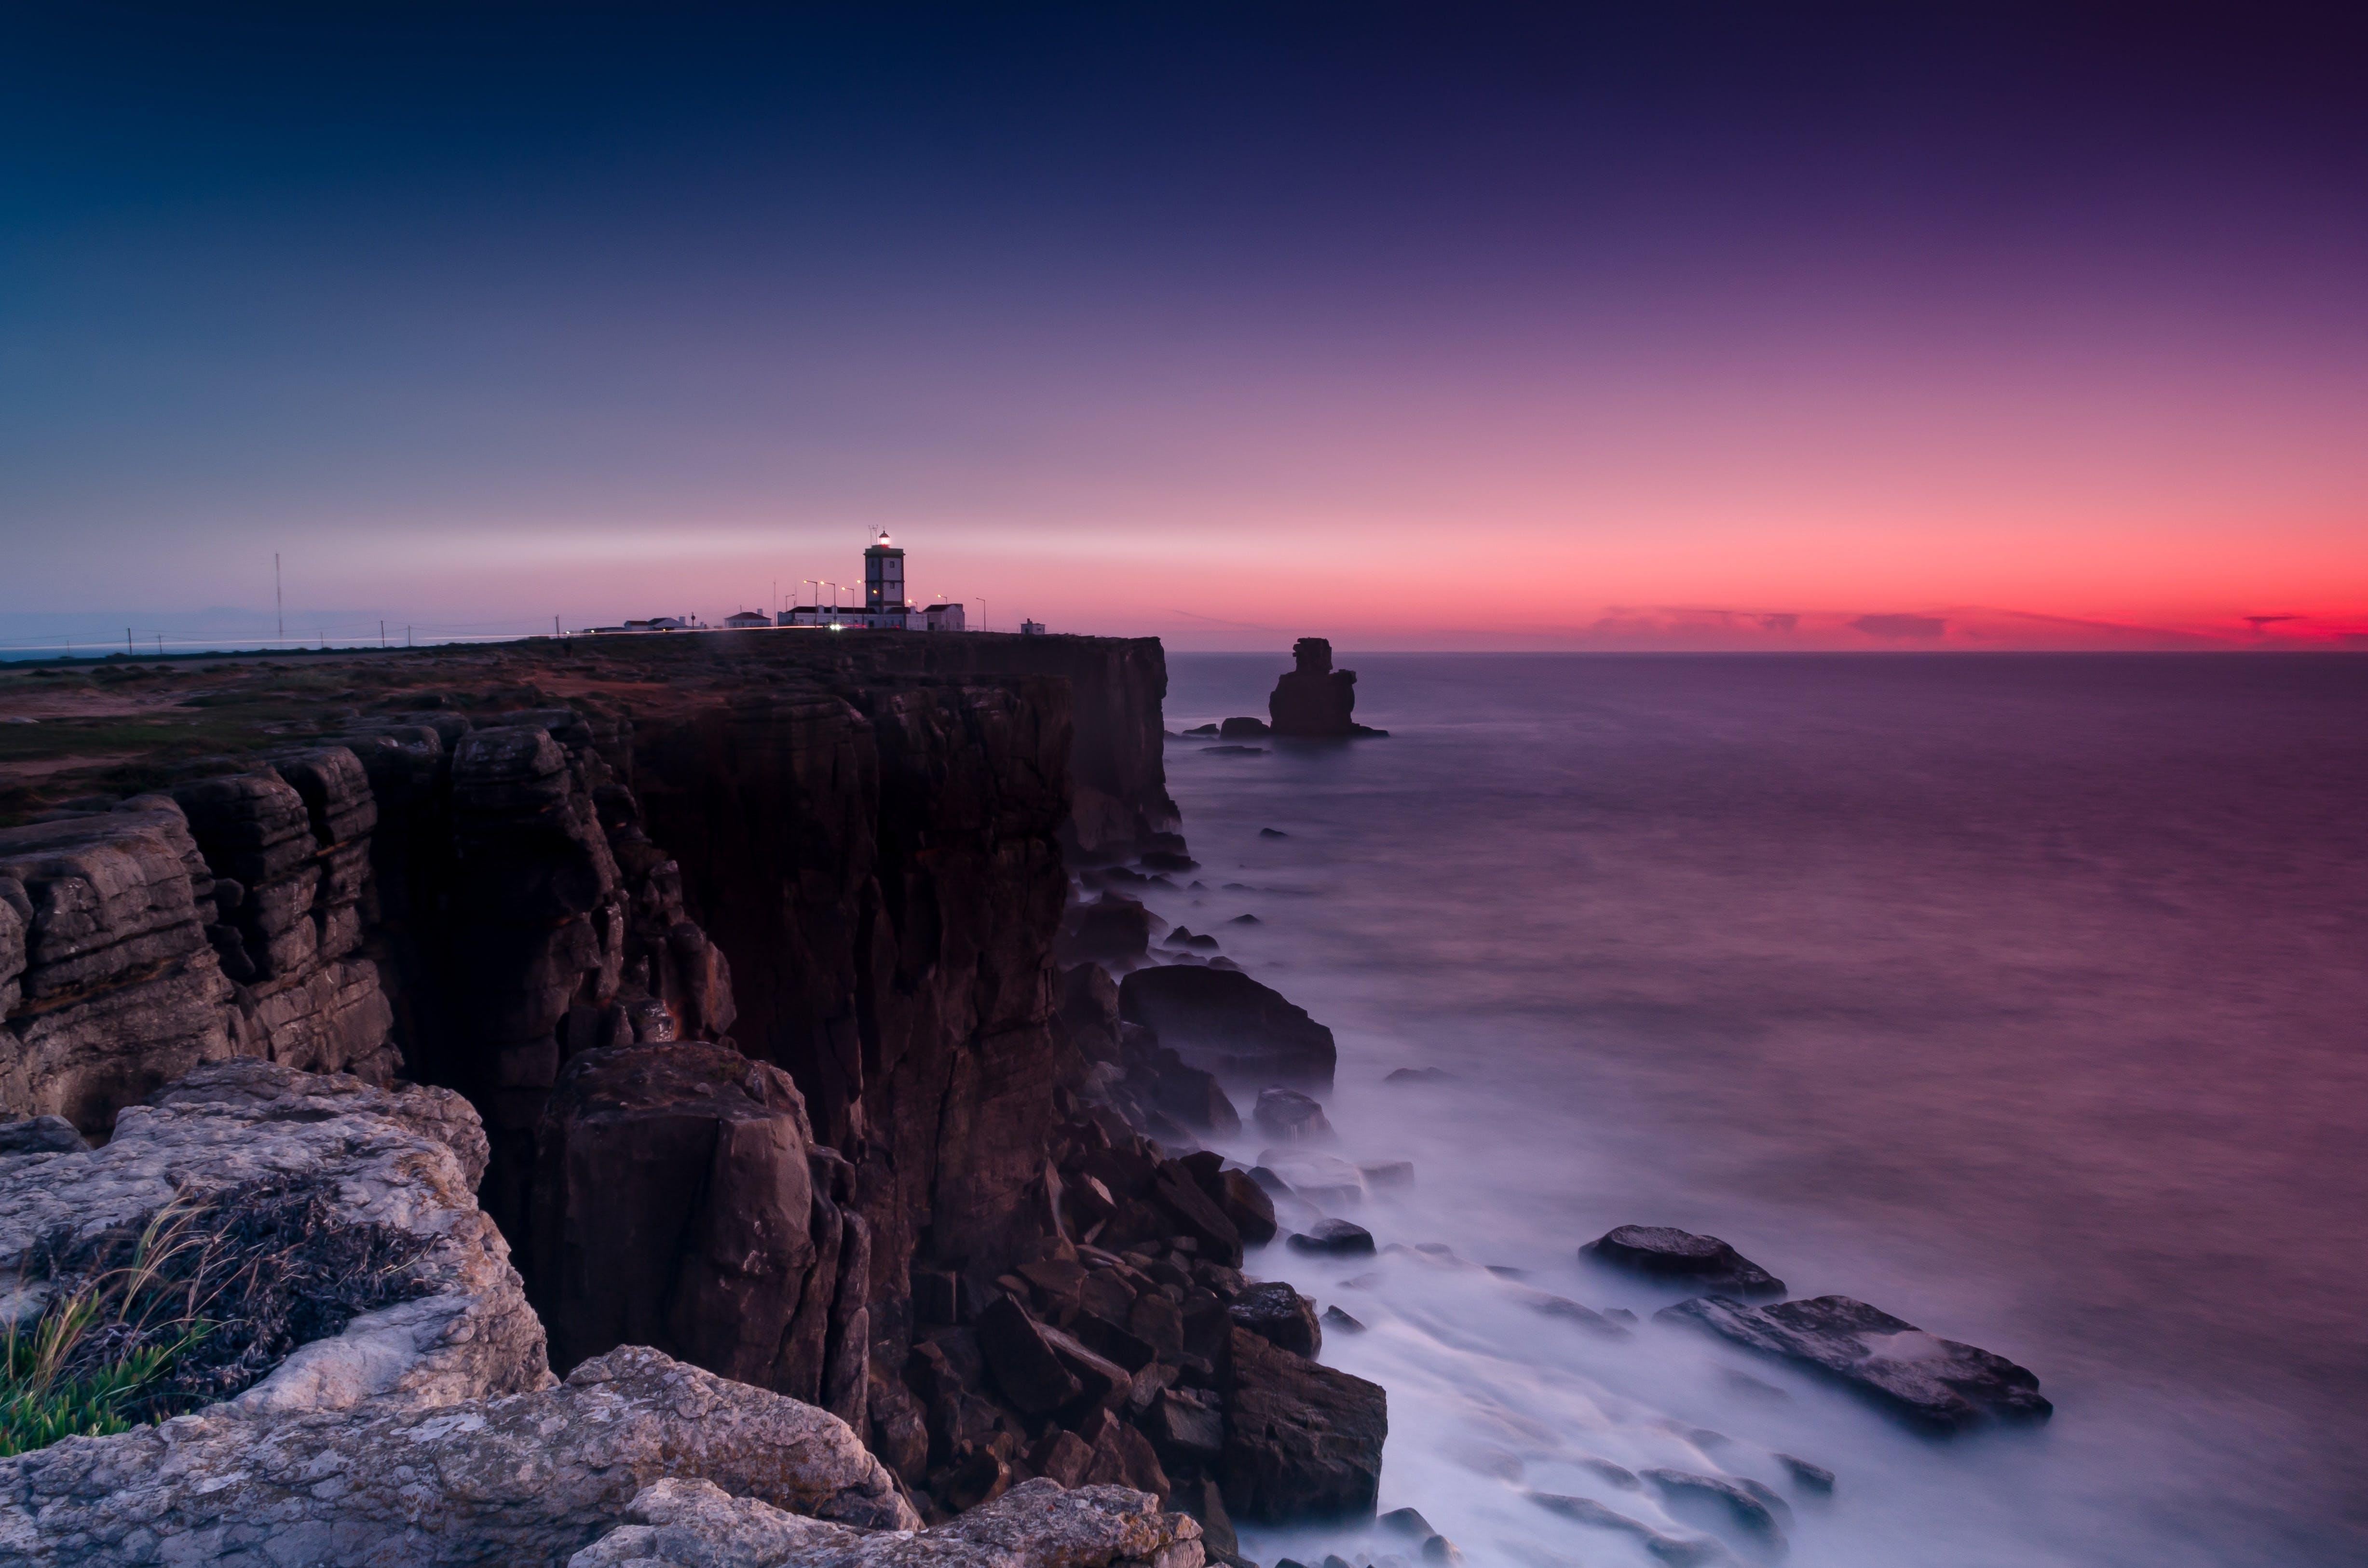 Scenic View Of Ocean Near Cliffs During Dawn